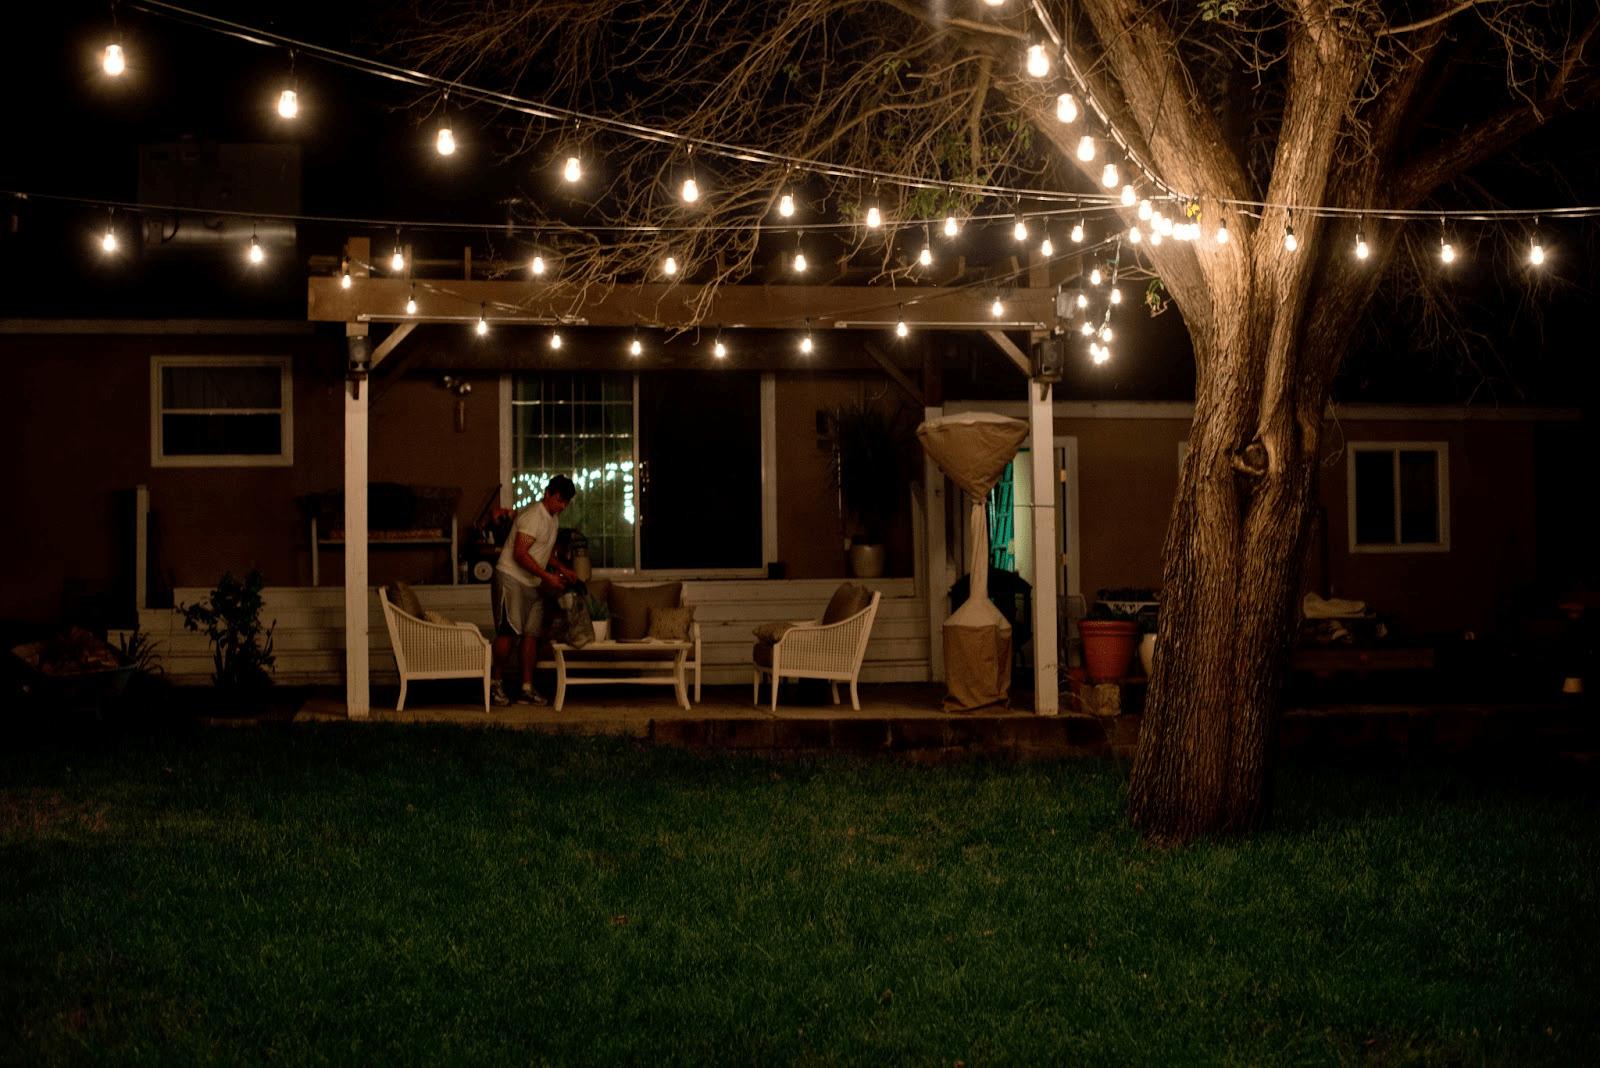 Types of Porch Lights